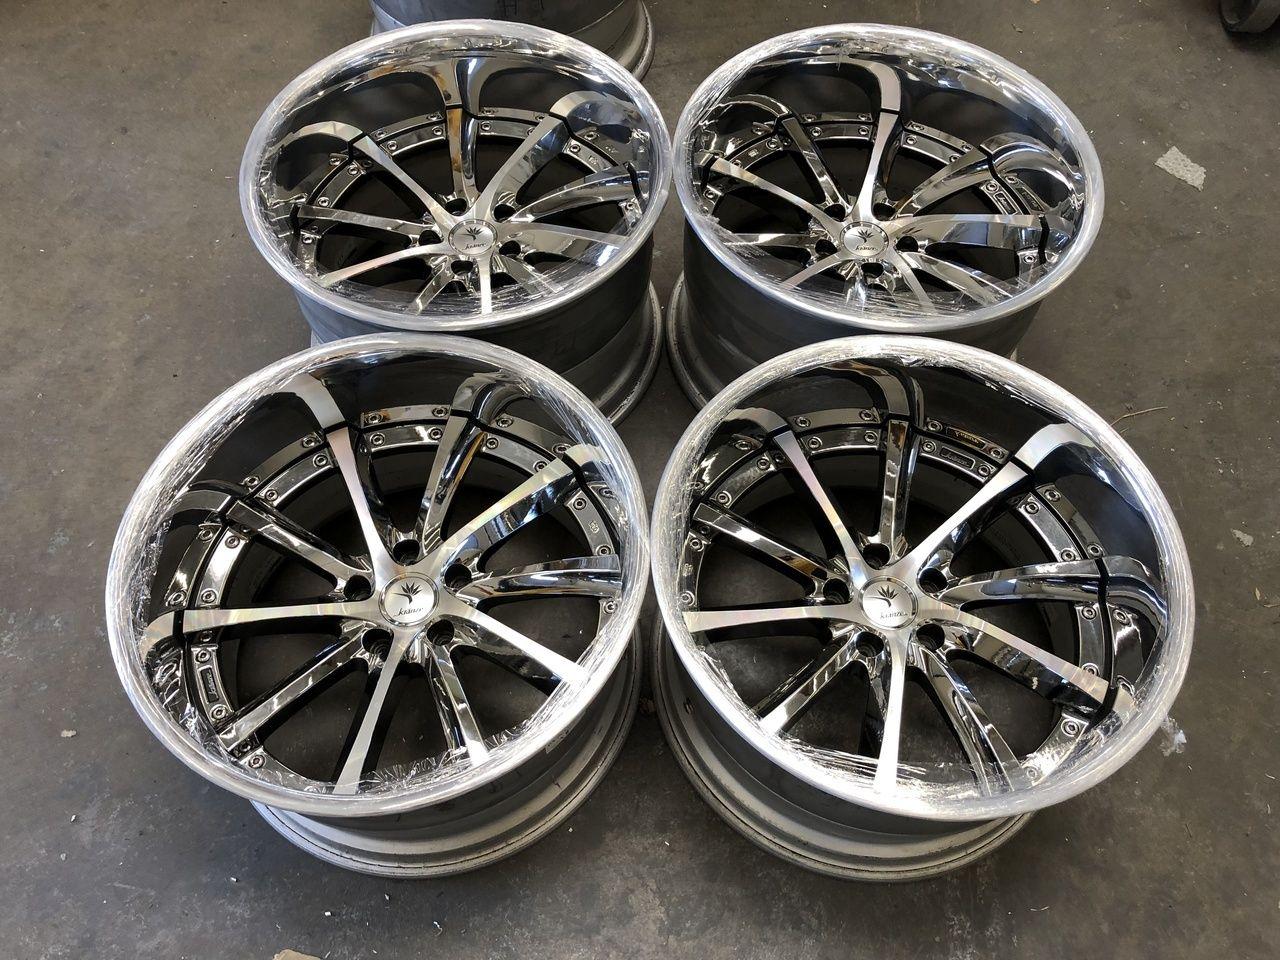 Weds Kranze Vishunu 5x114 3 19x11 5 20 19x12 5 Threepieceus Wedding Car Wheel Jdm